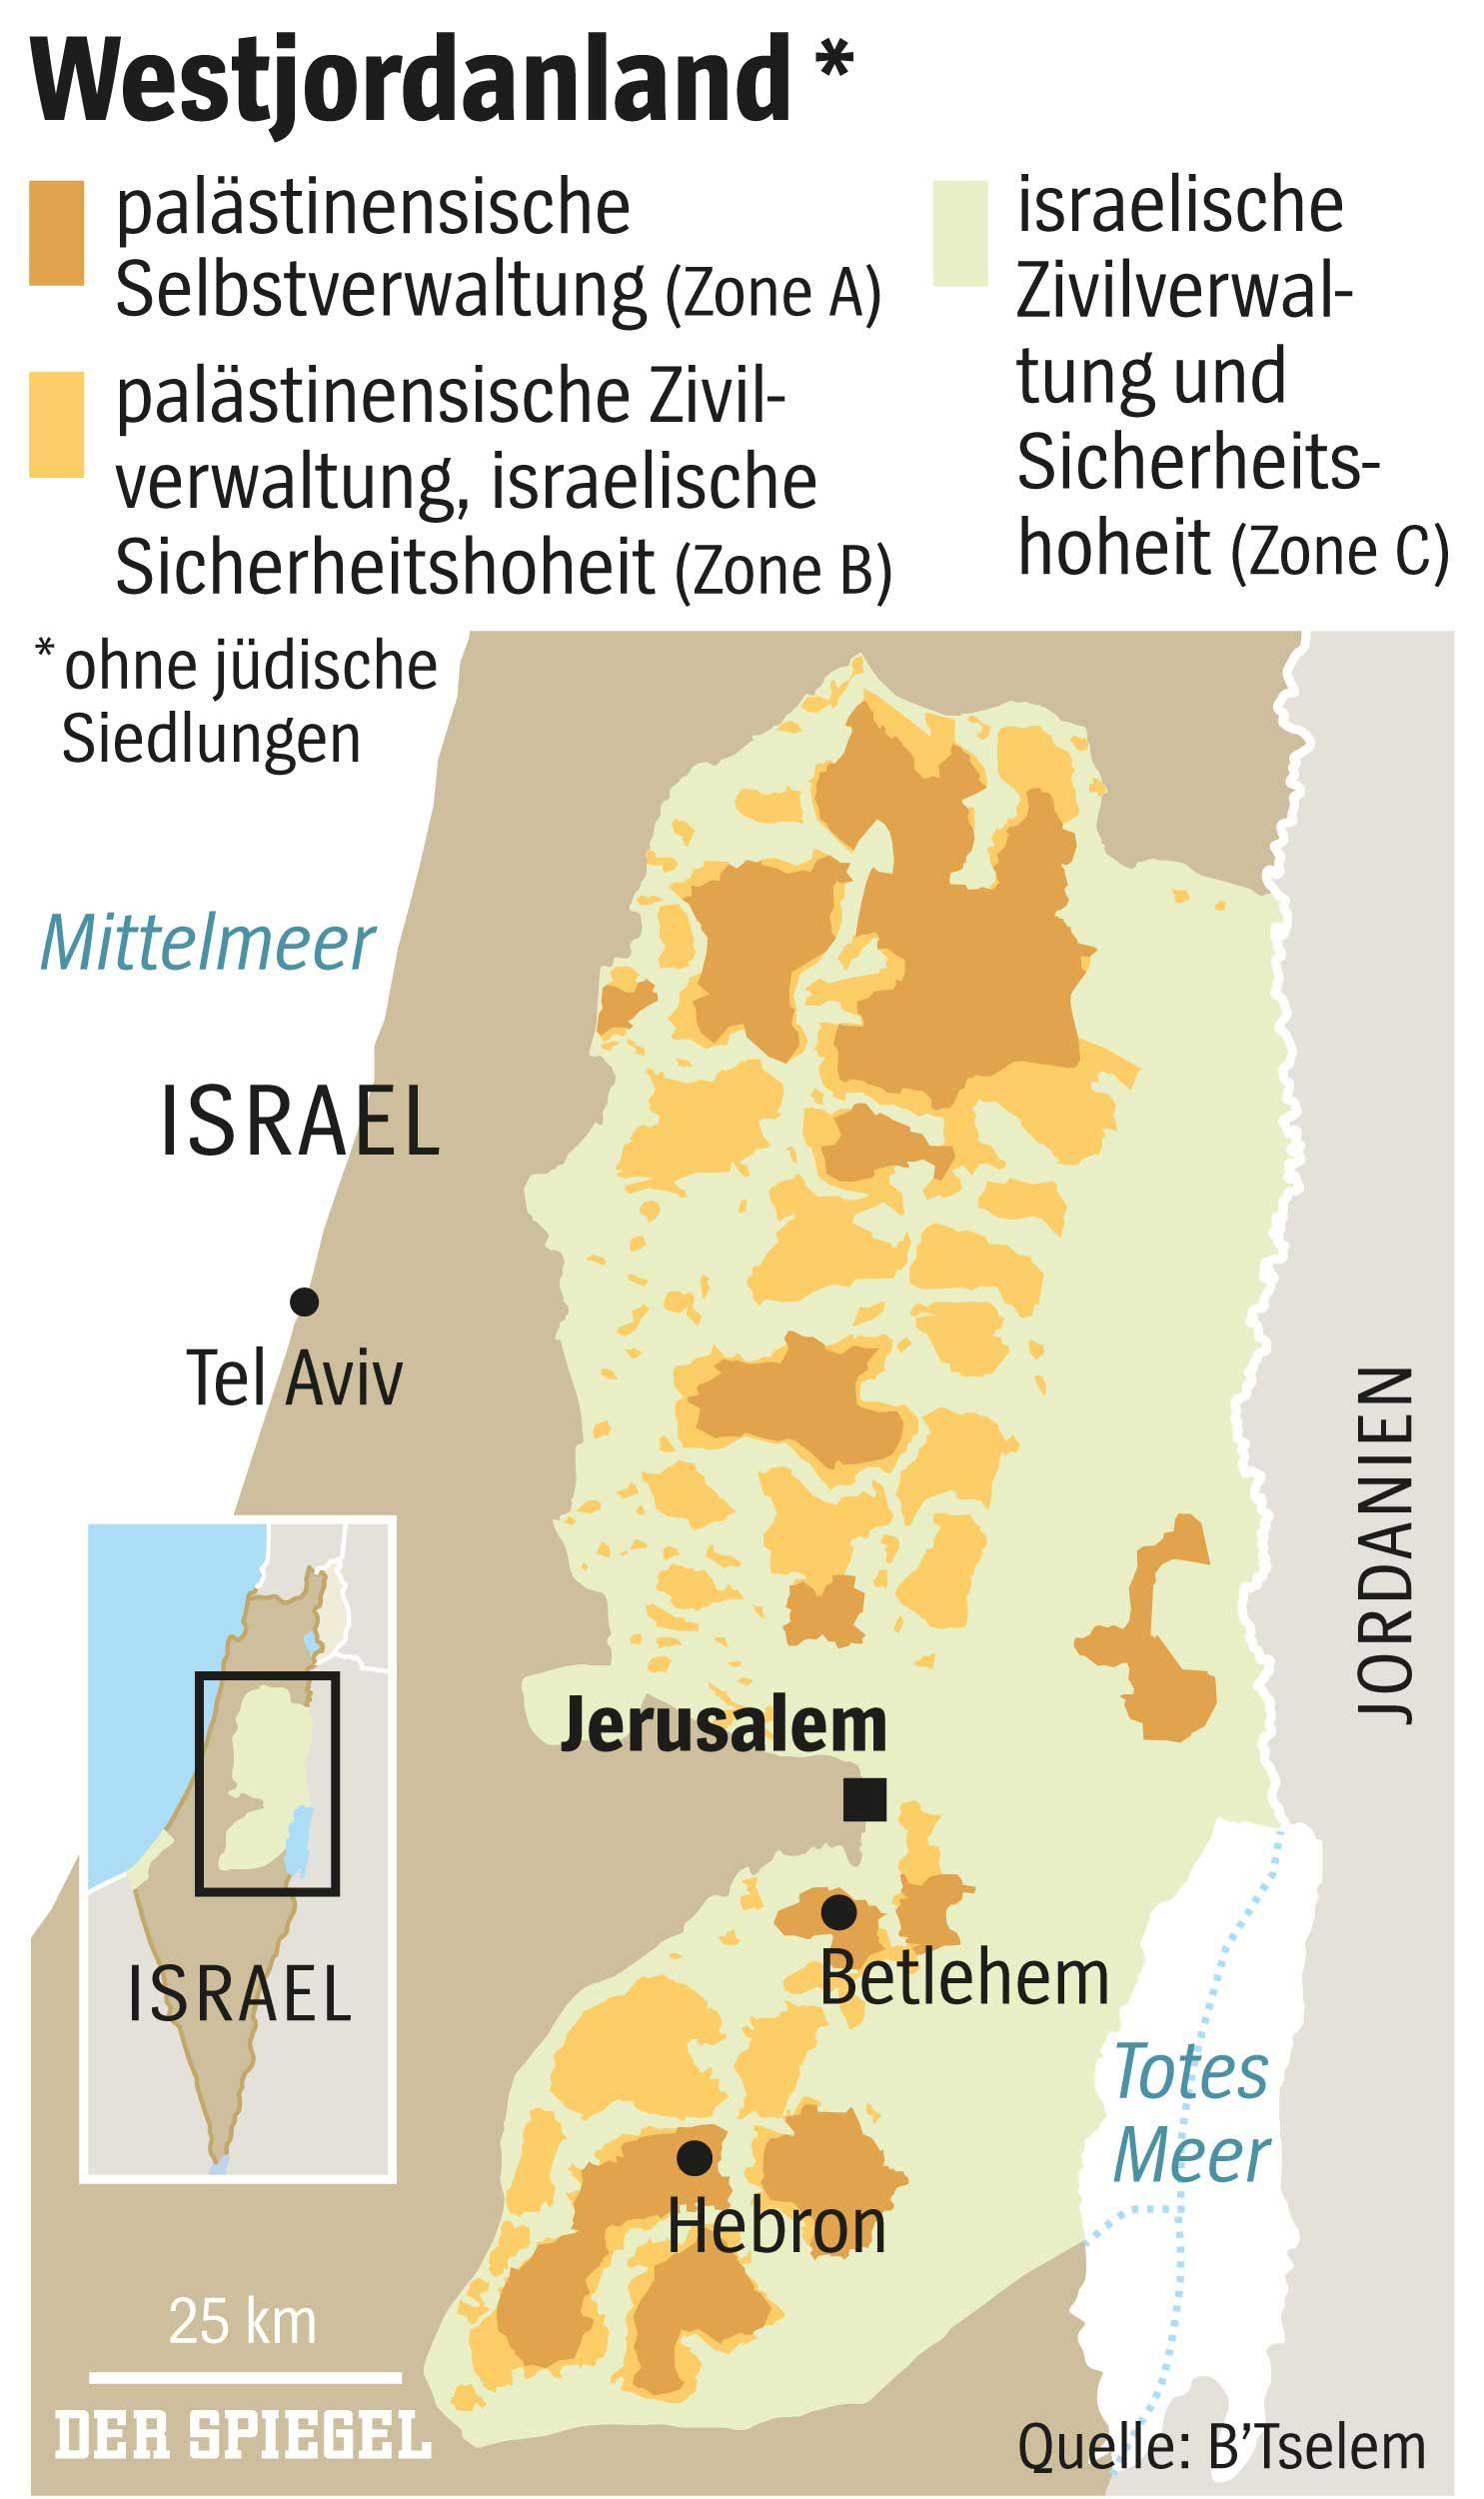 SP 26/2017, S.98 Grafik Israel / Westjordanland / Streitgespräch